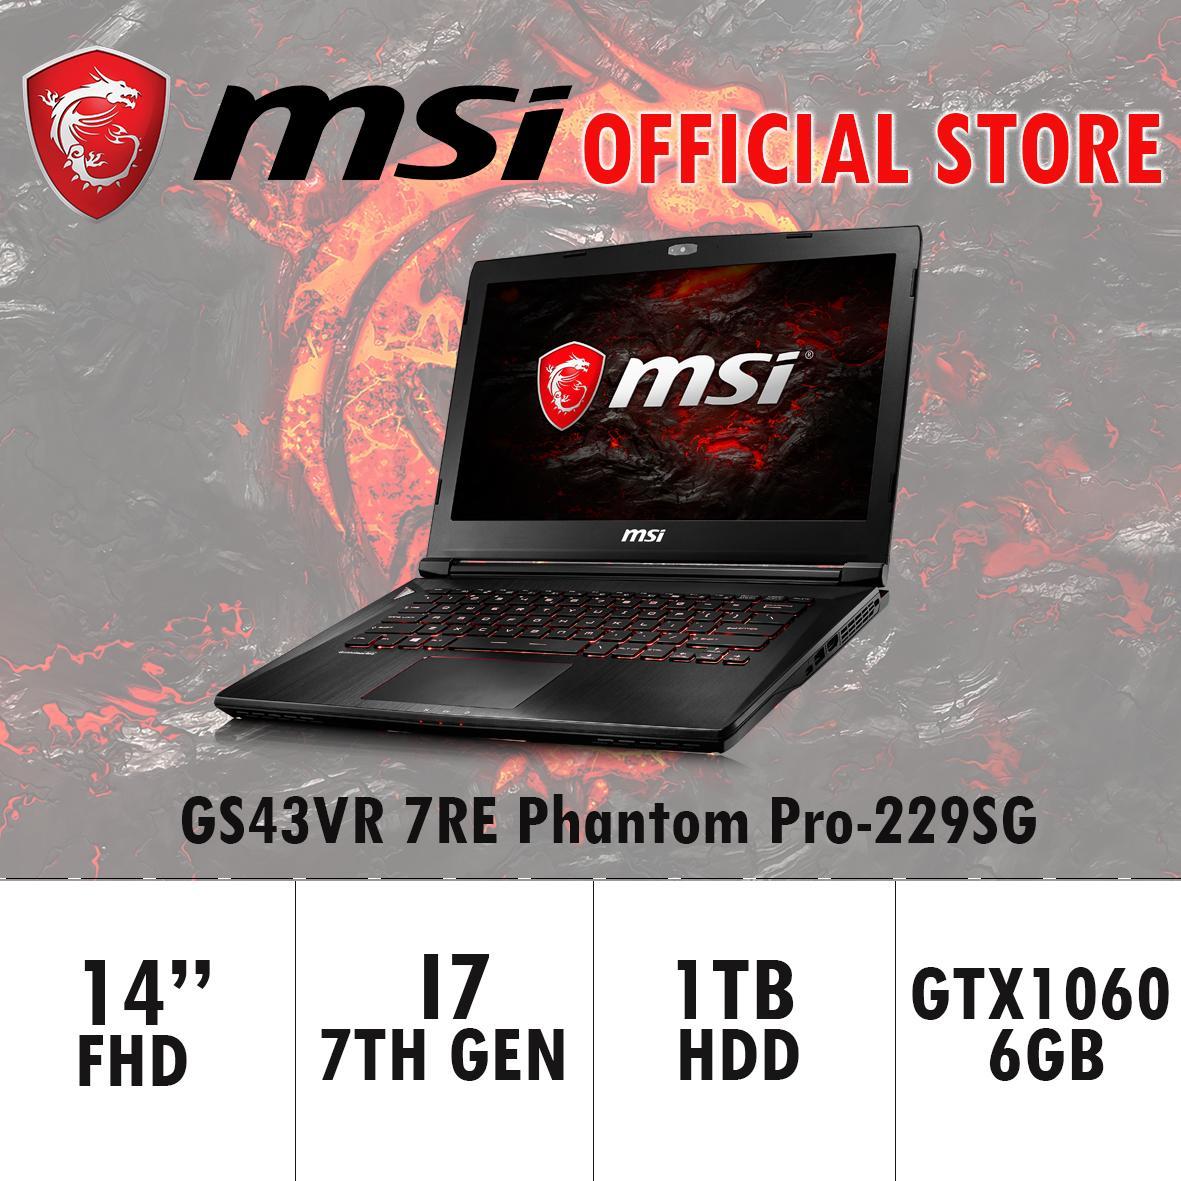 MSI GS43VR 7RE Phantom Pro-229SG (I7-7700HQ/16GB DDR4/128GB SSD +1TB HDD/6GB NVIDIA GTX1060) GAMING LAPTOP